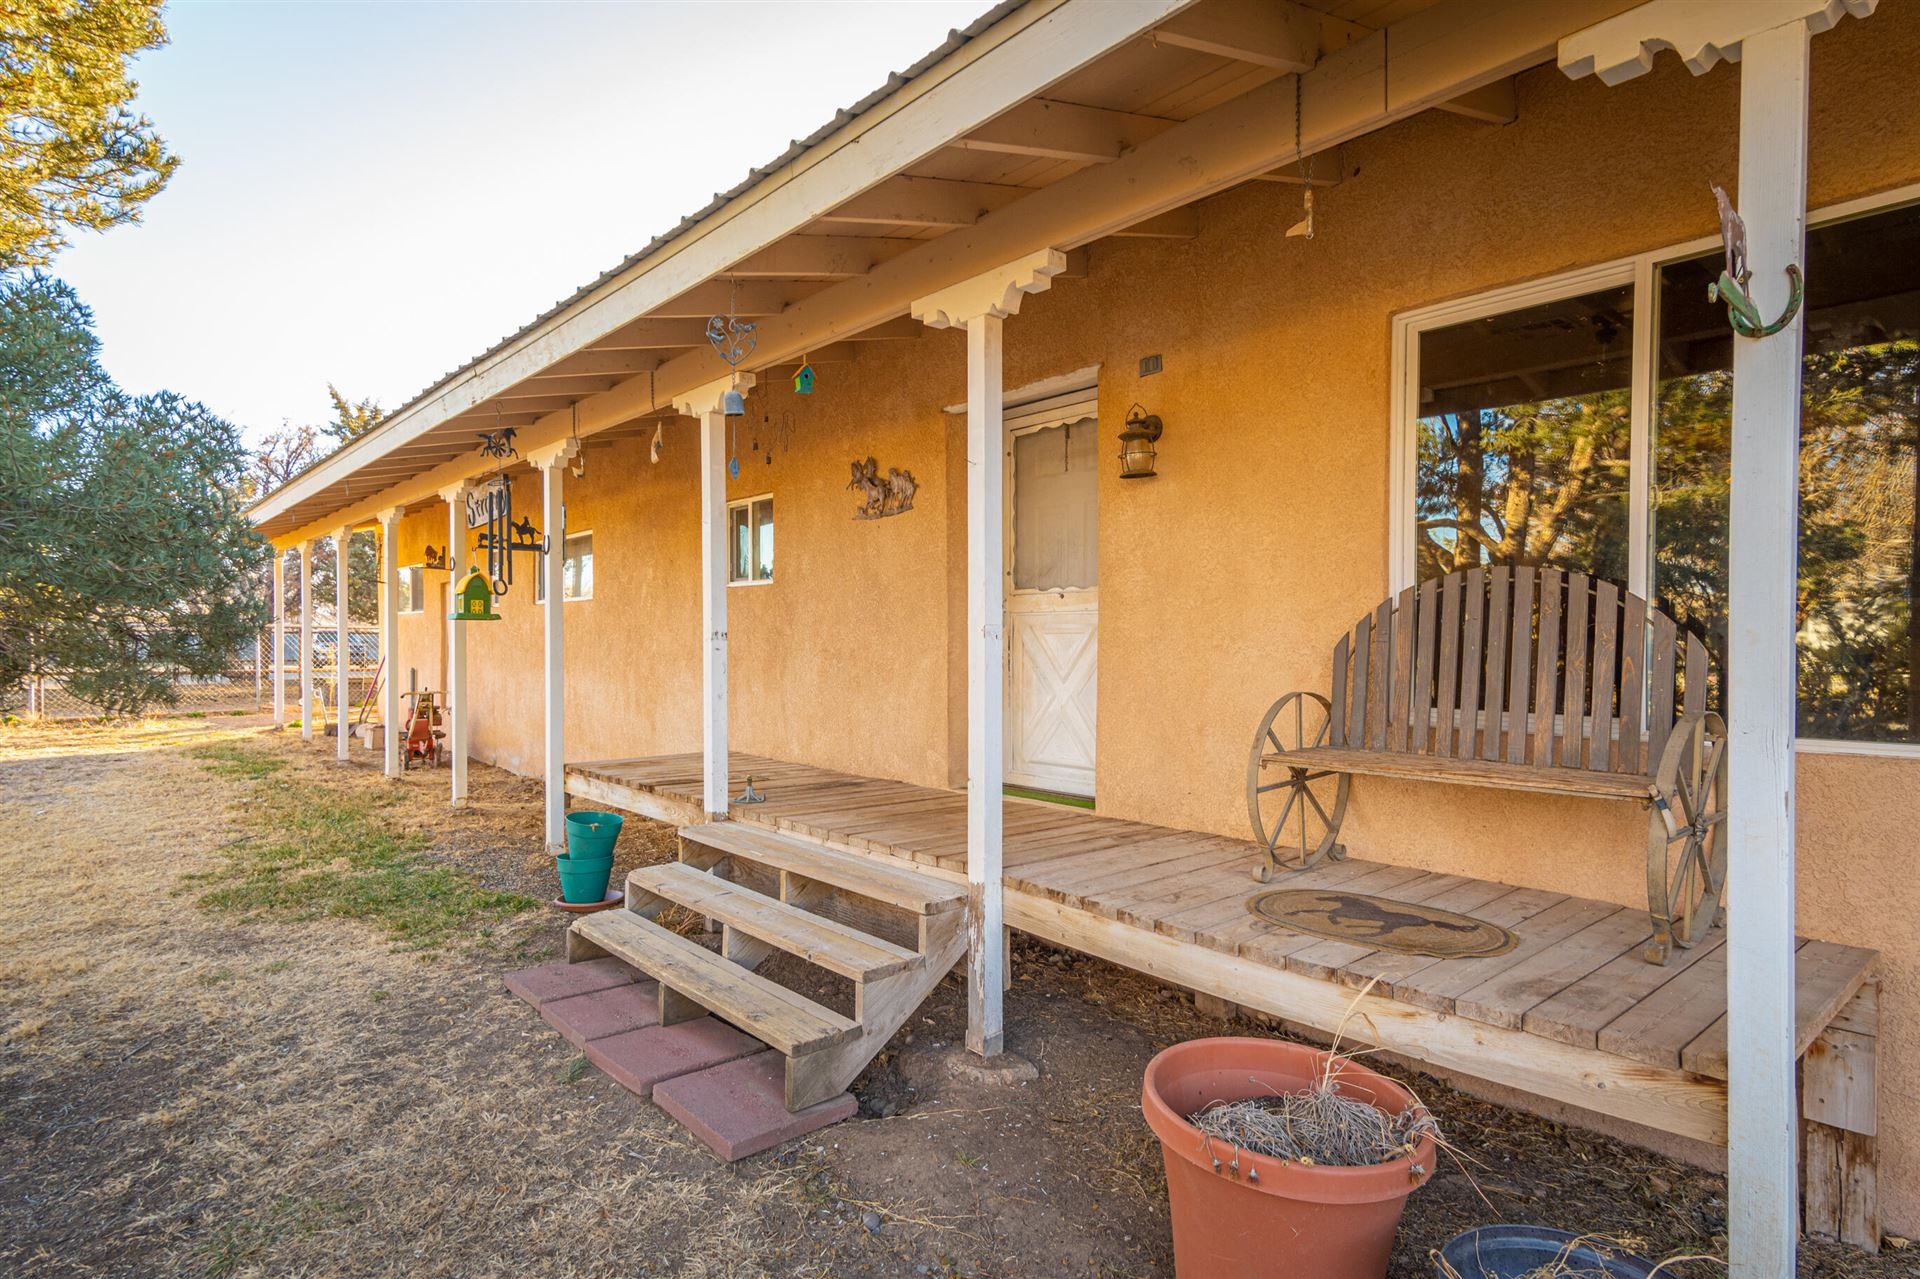 1735 BETTS Lane, Bosque Farms, NM 87068 - MLS#: 985443